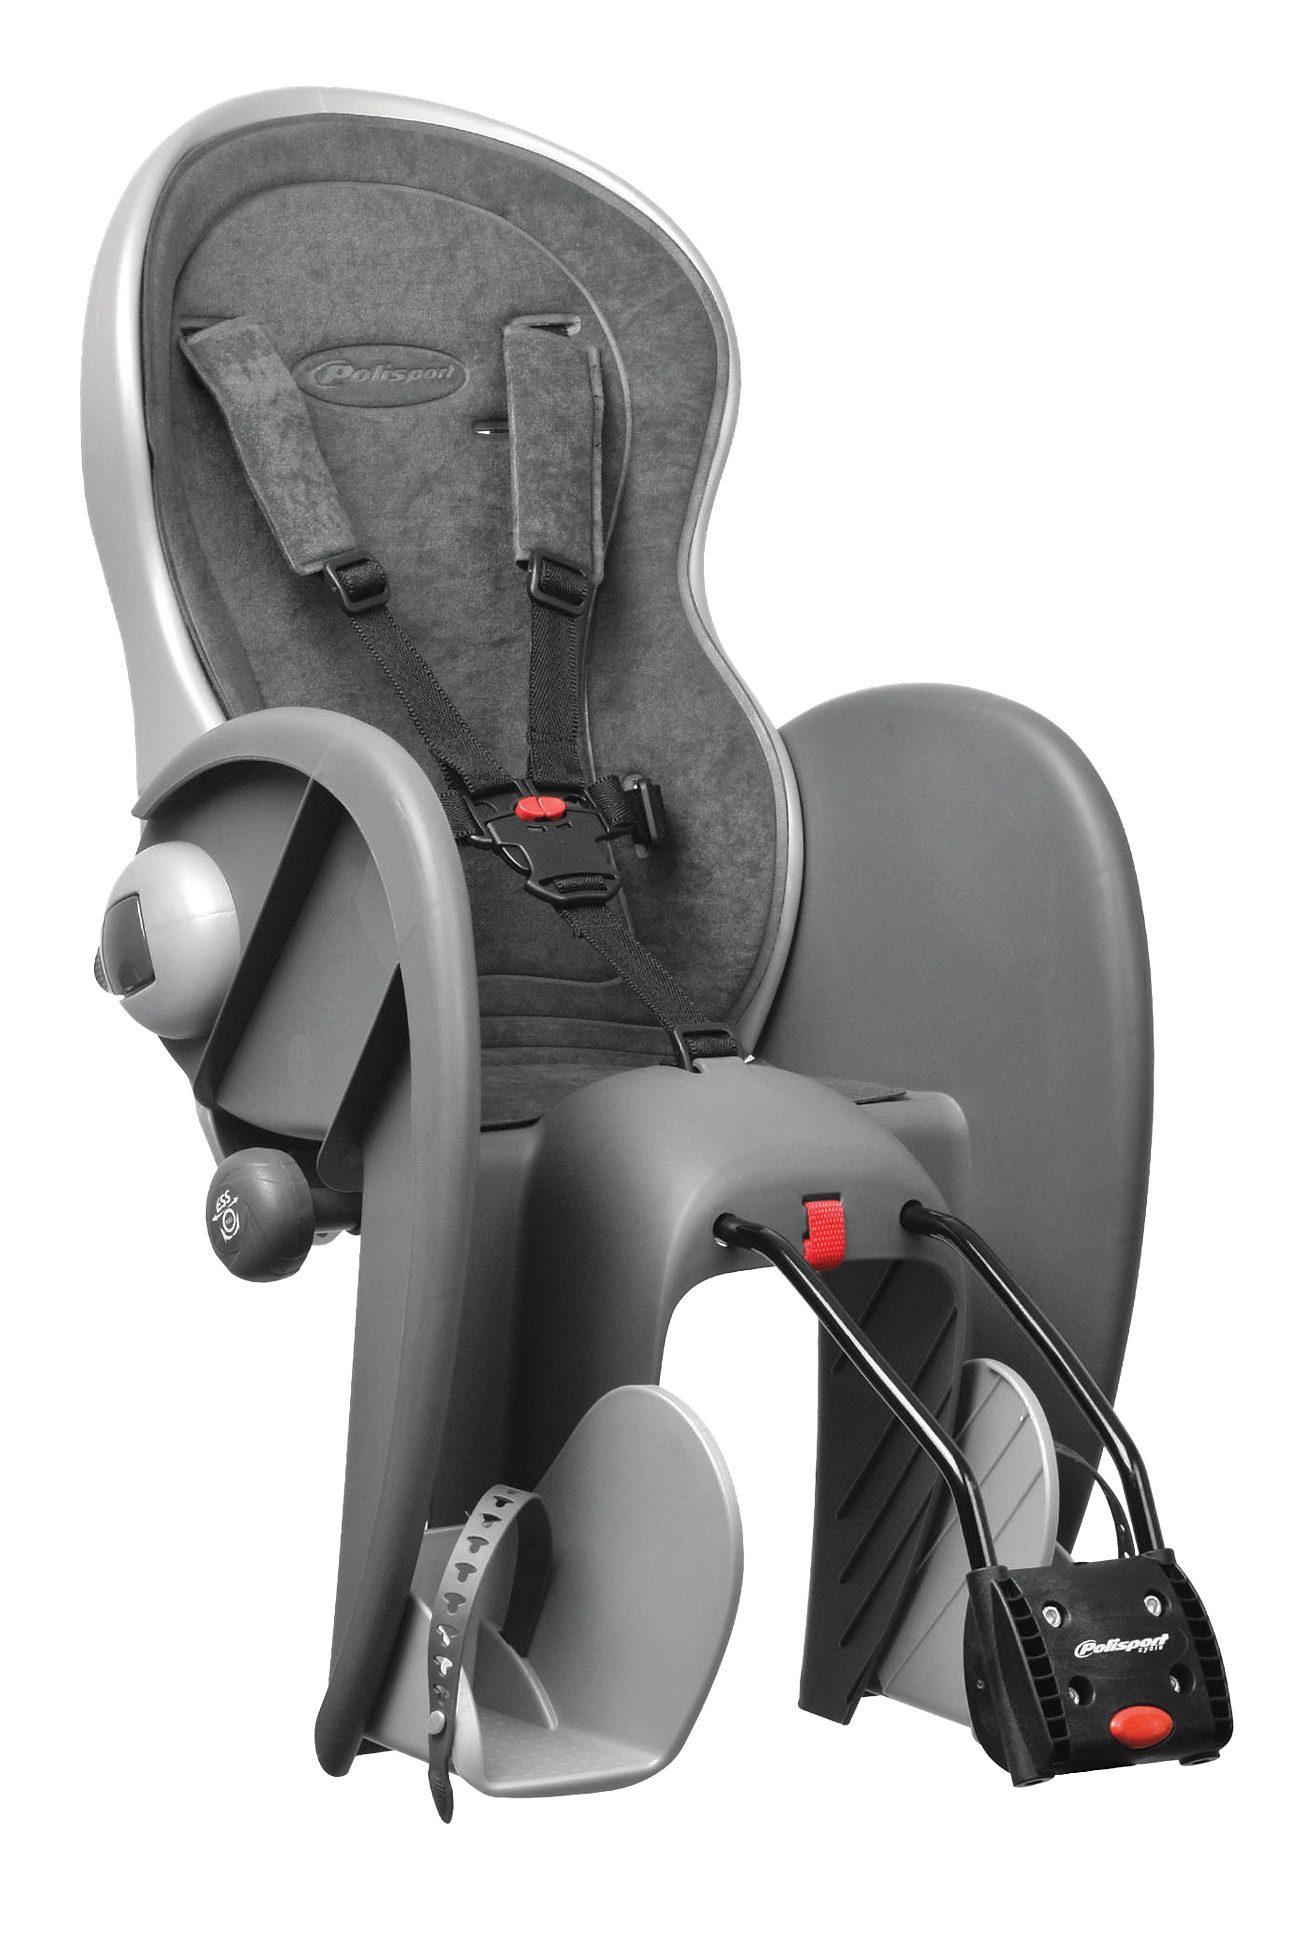 Polisport Fahrrad Kindersitz, grau, »Wallaby Evolution Deluxe«